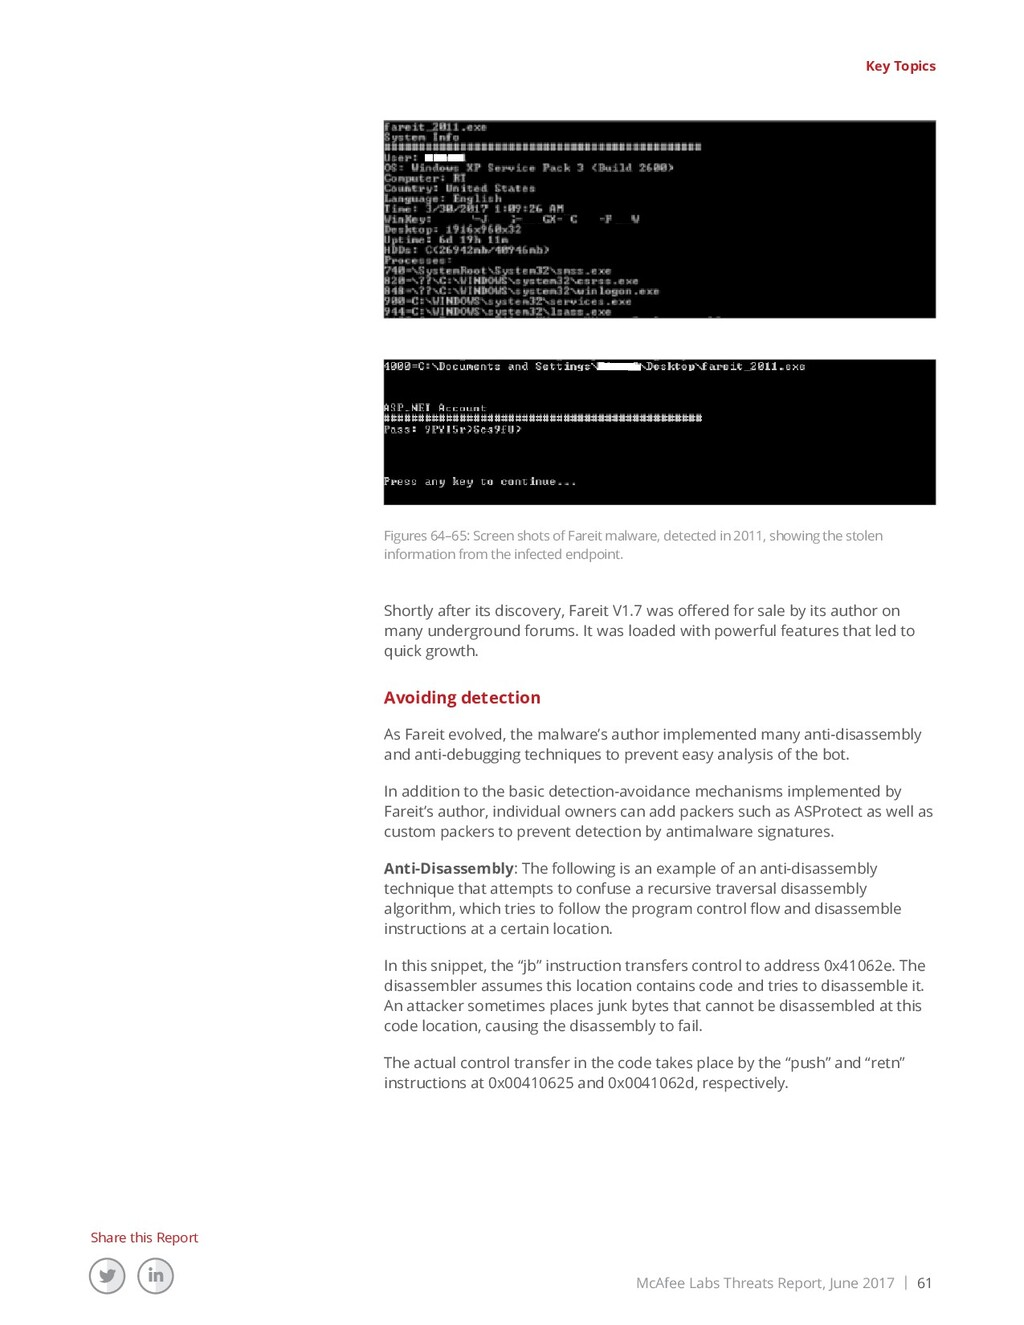 McAfee Labs Threats Report, June 2017 | 61 Shar...